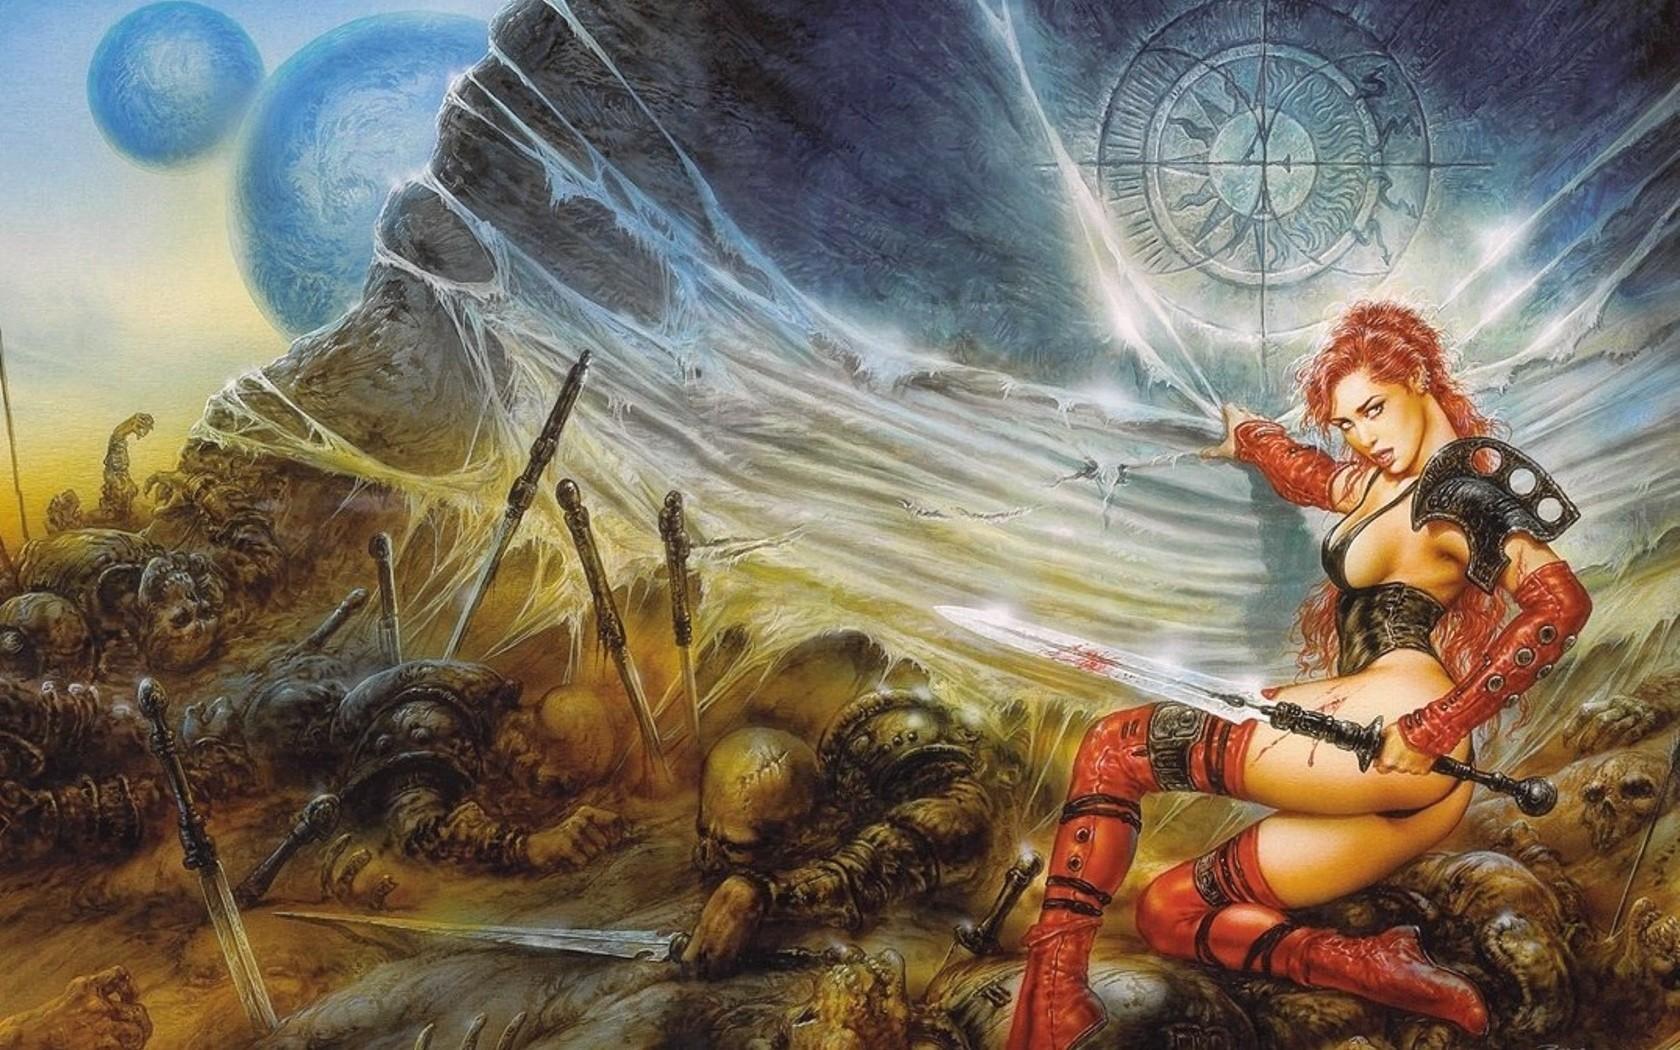 General 1680x1050 Luis Royo fantasy girl ass artwork